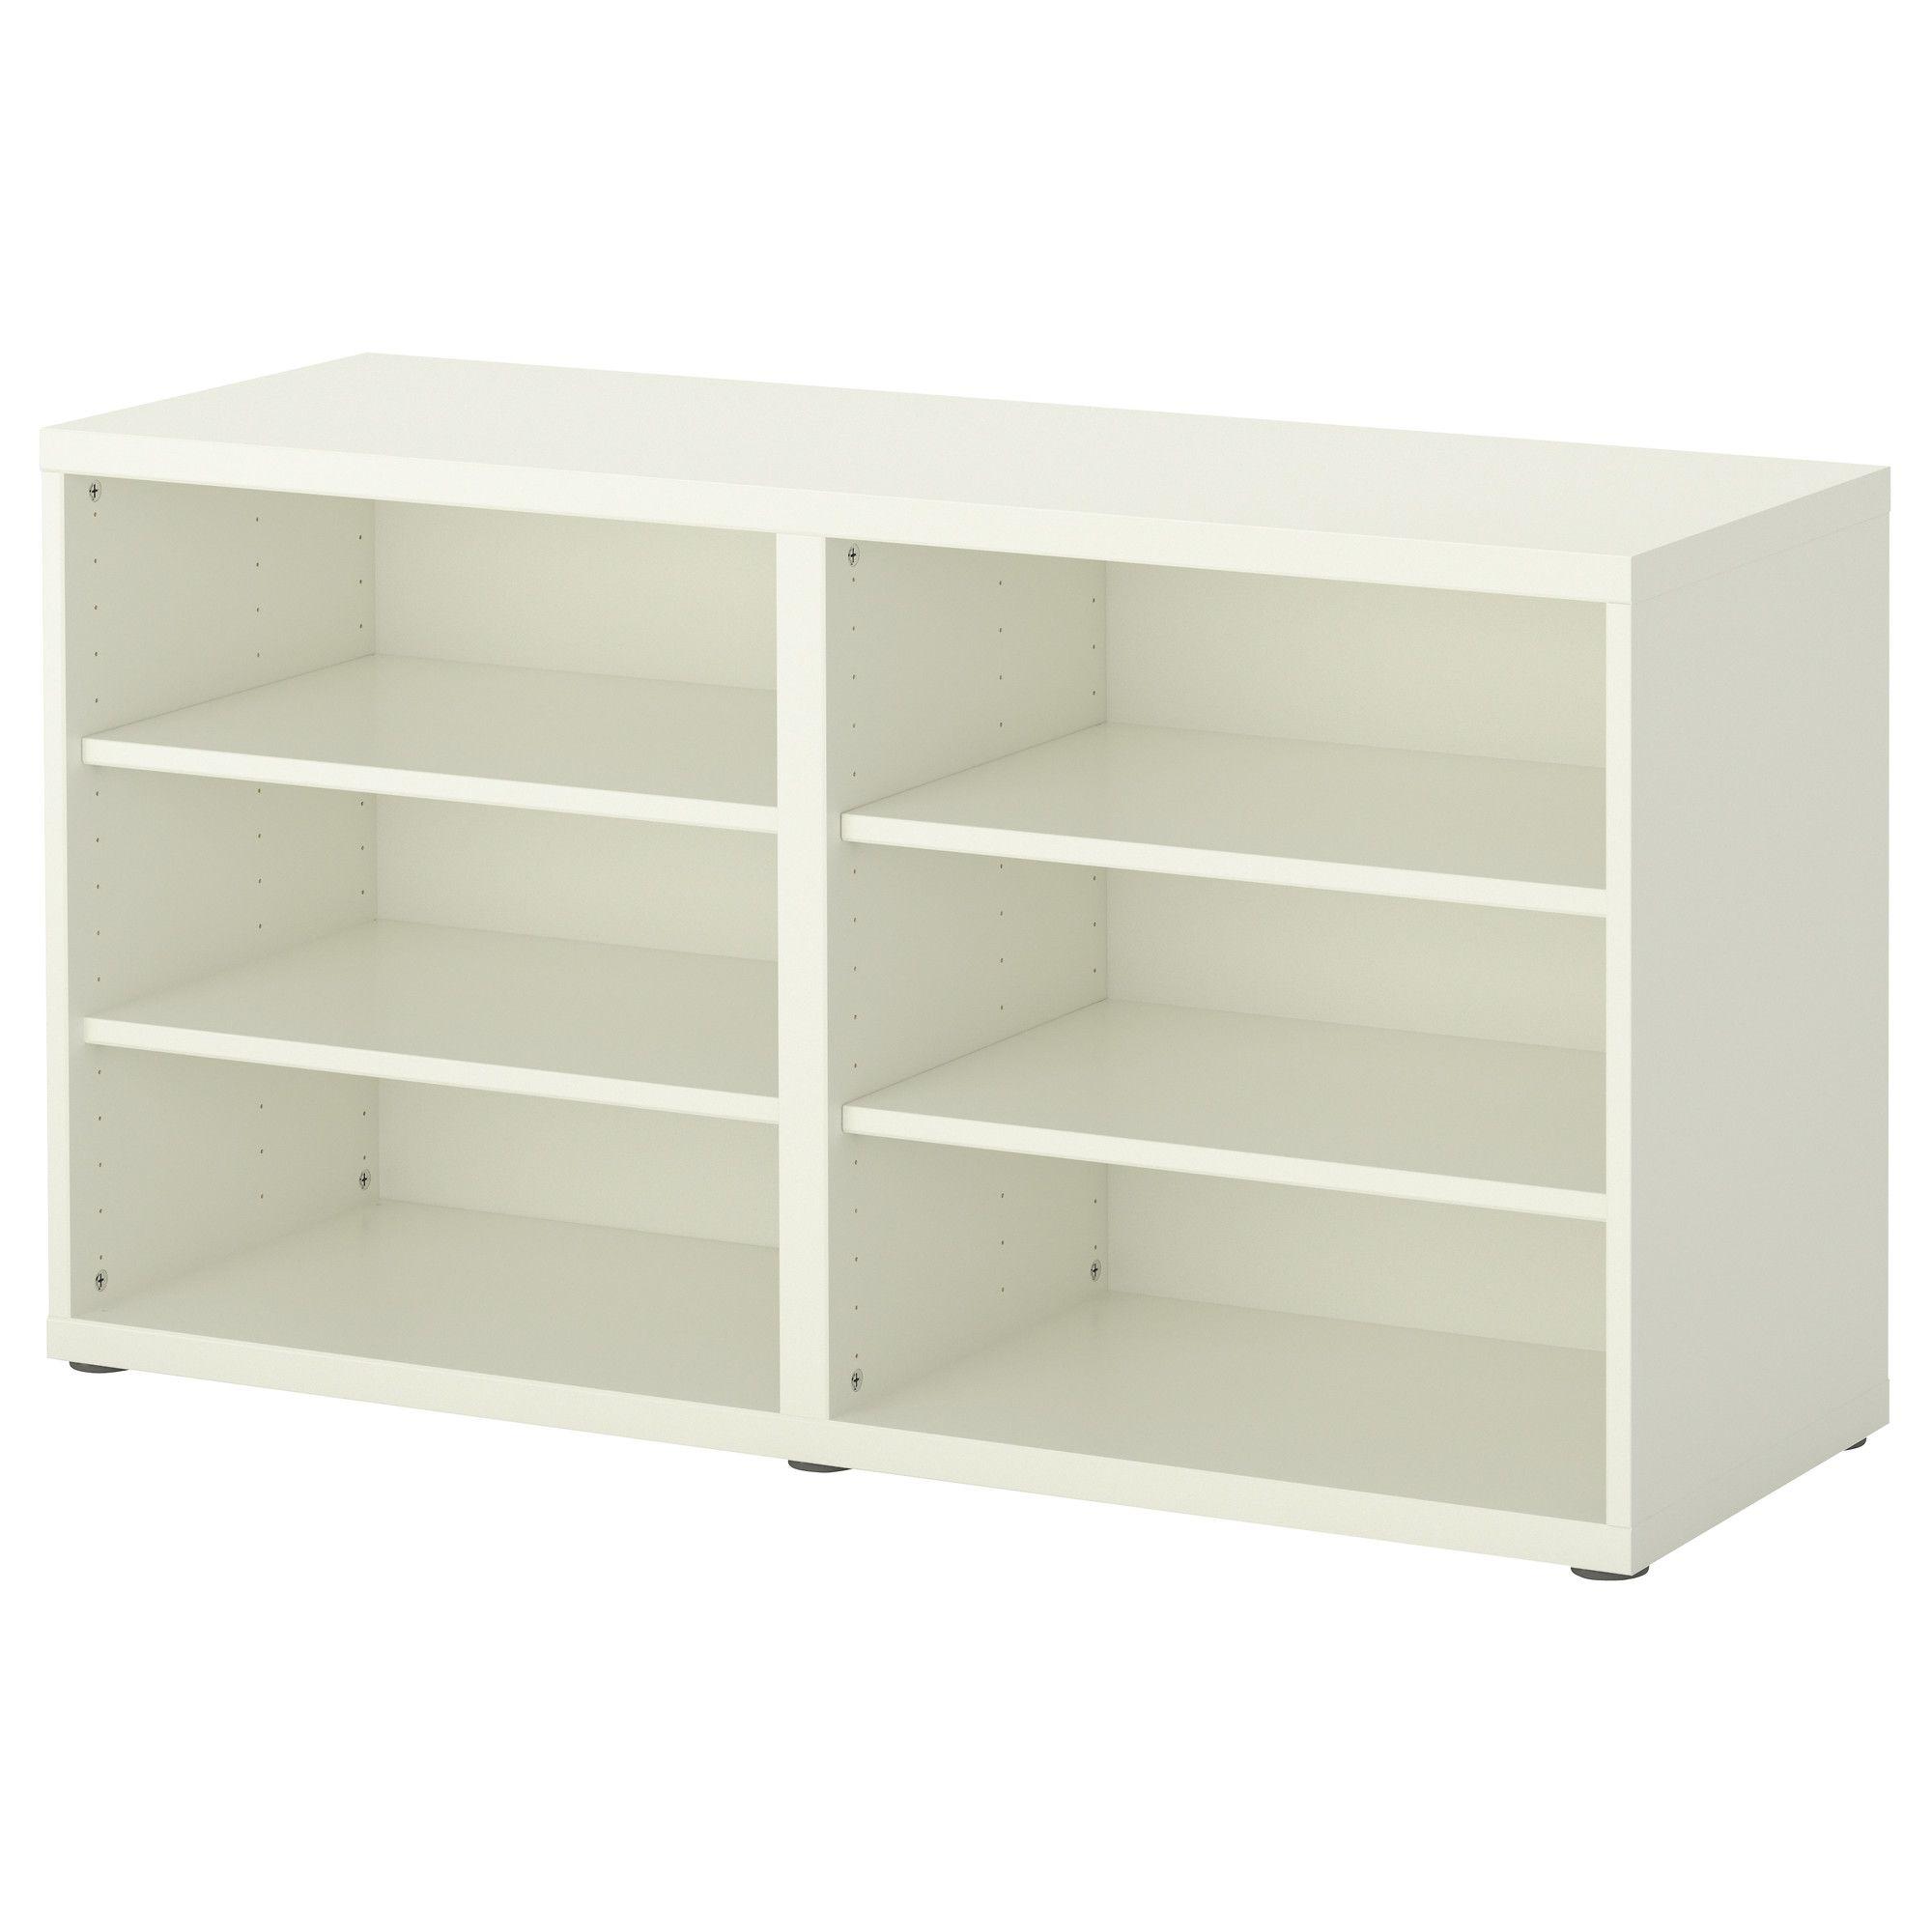 BestÅ Shelf Unitheight Extension Unit  White  Ikea $70